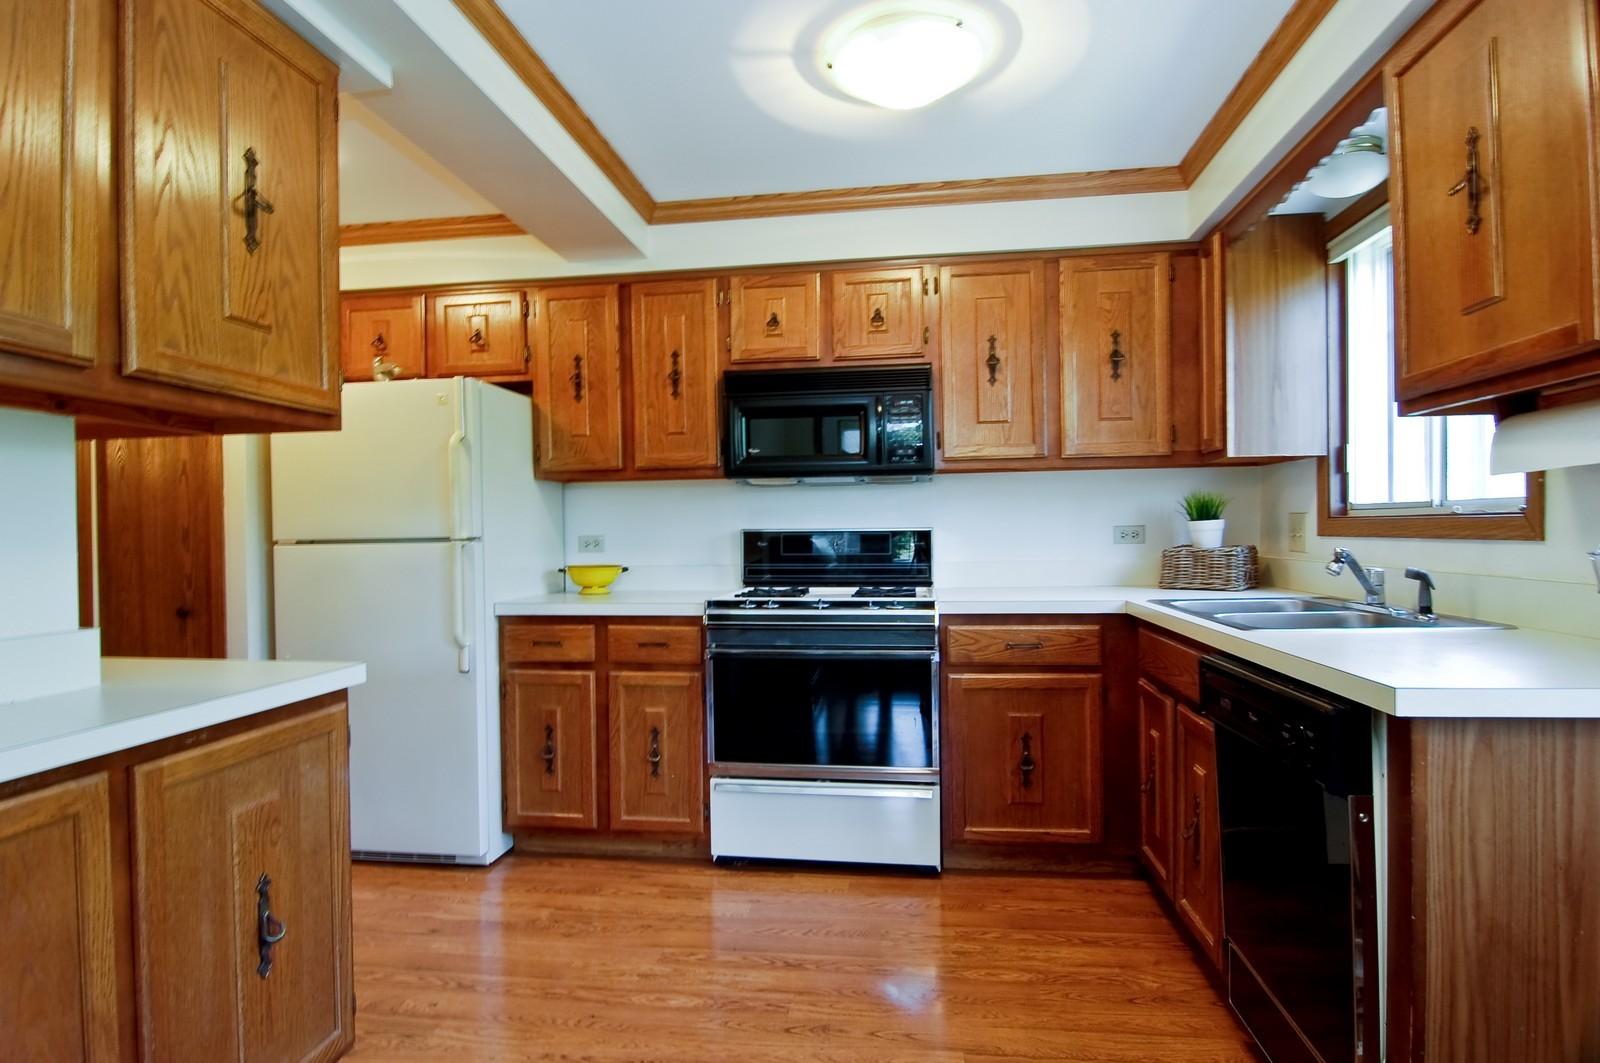 Real Estate Photography - 466 S President, Unit 204, Carol Stream, IL, 60188 - Kitchen